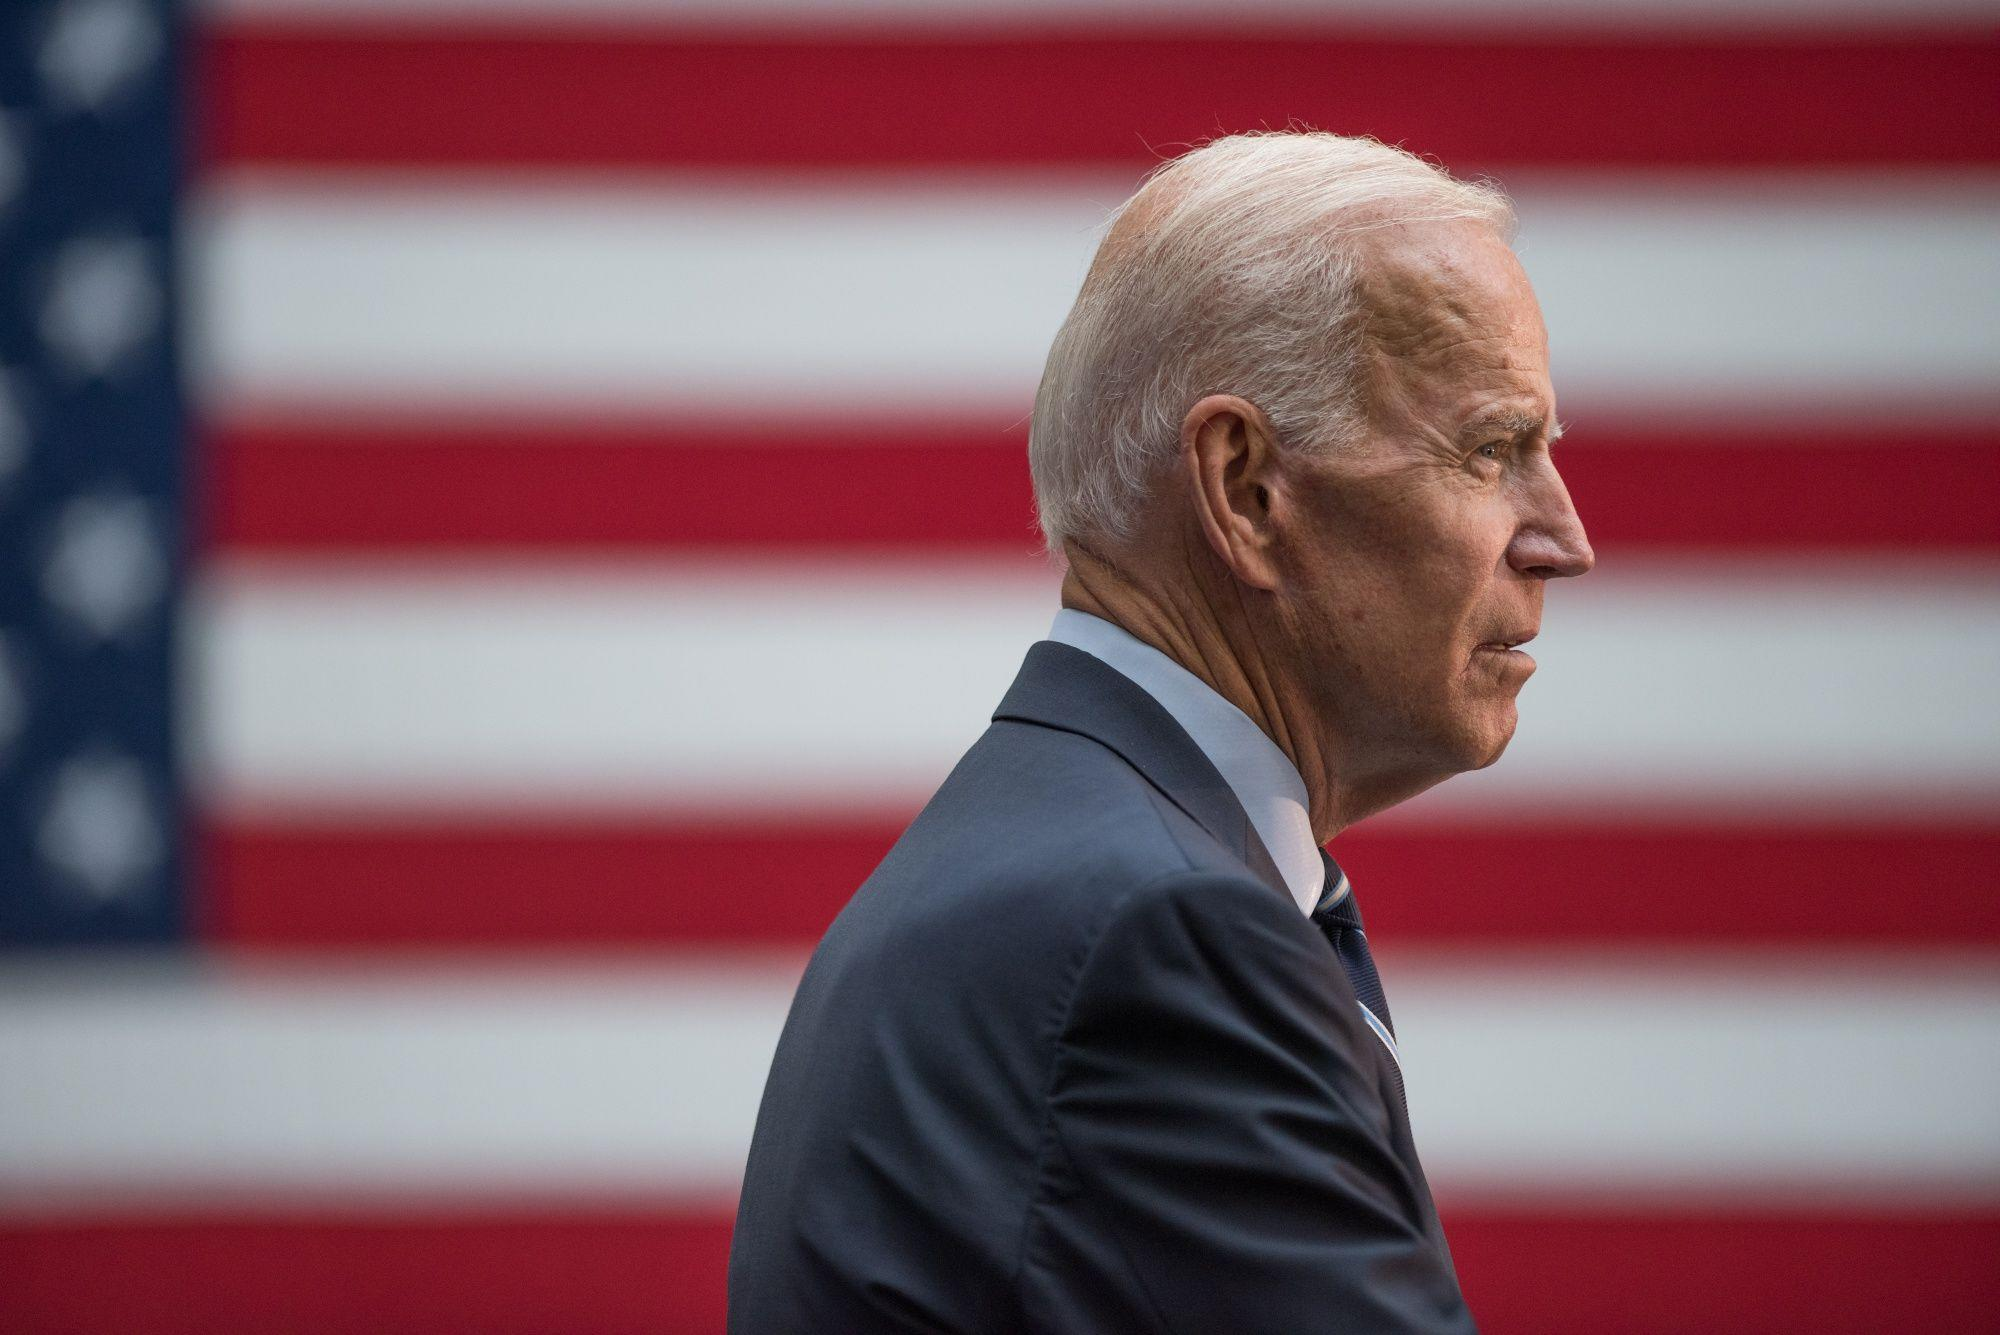 Lineups are for next 2020 Democratic debates